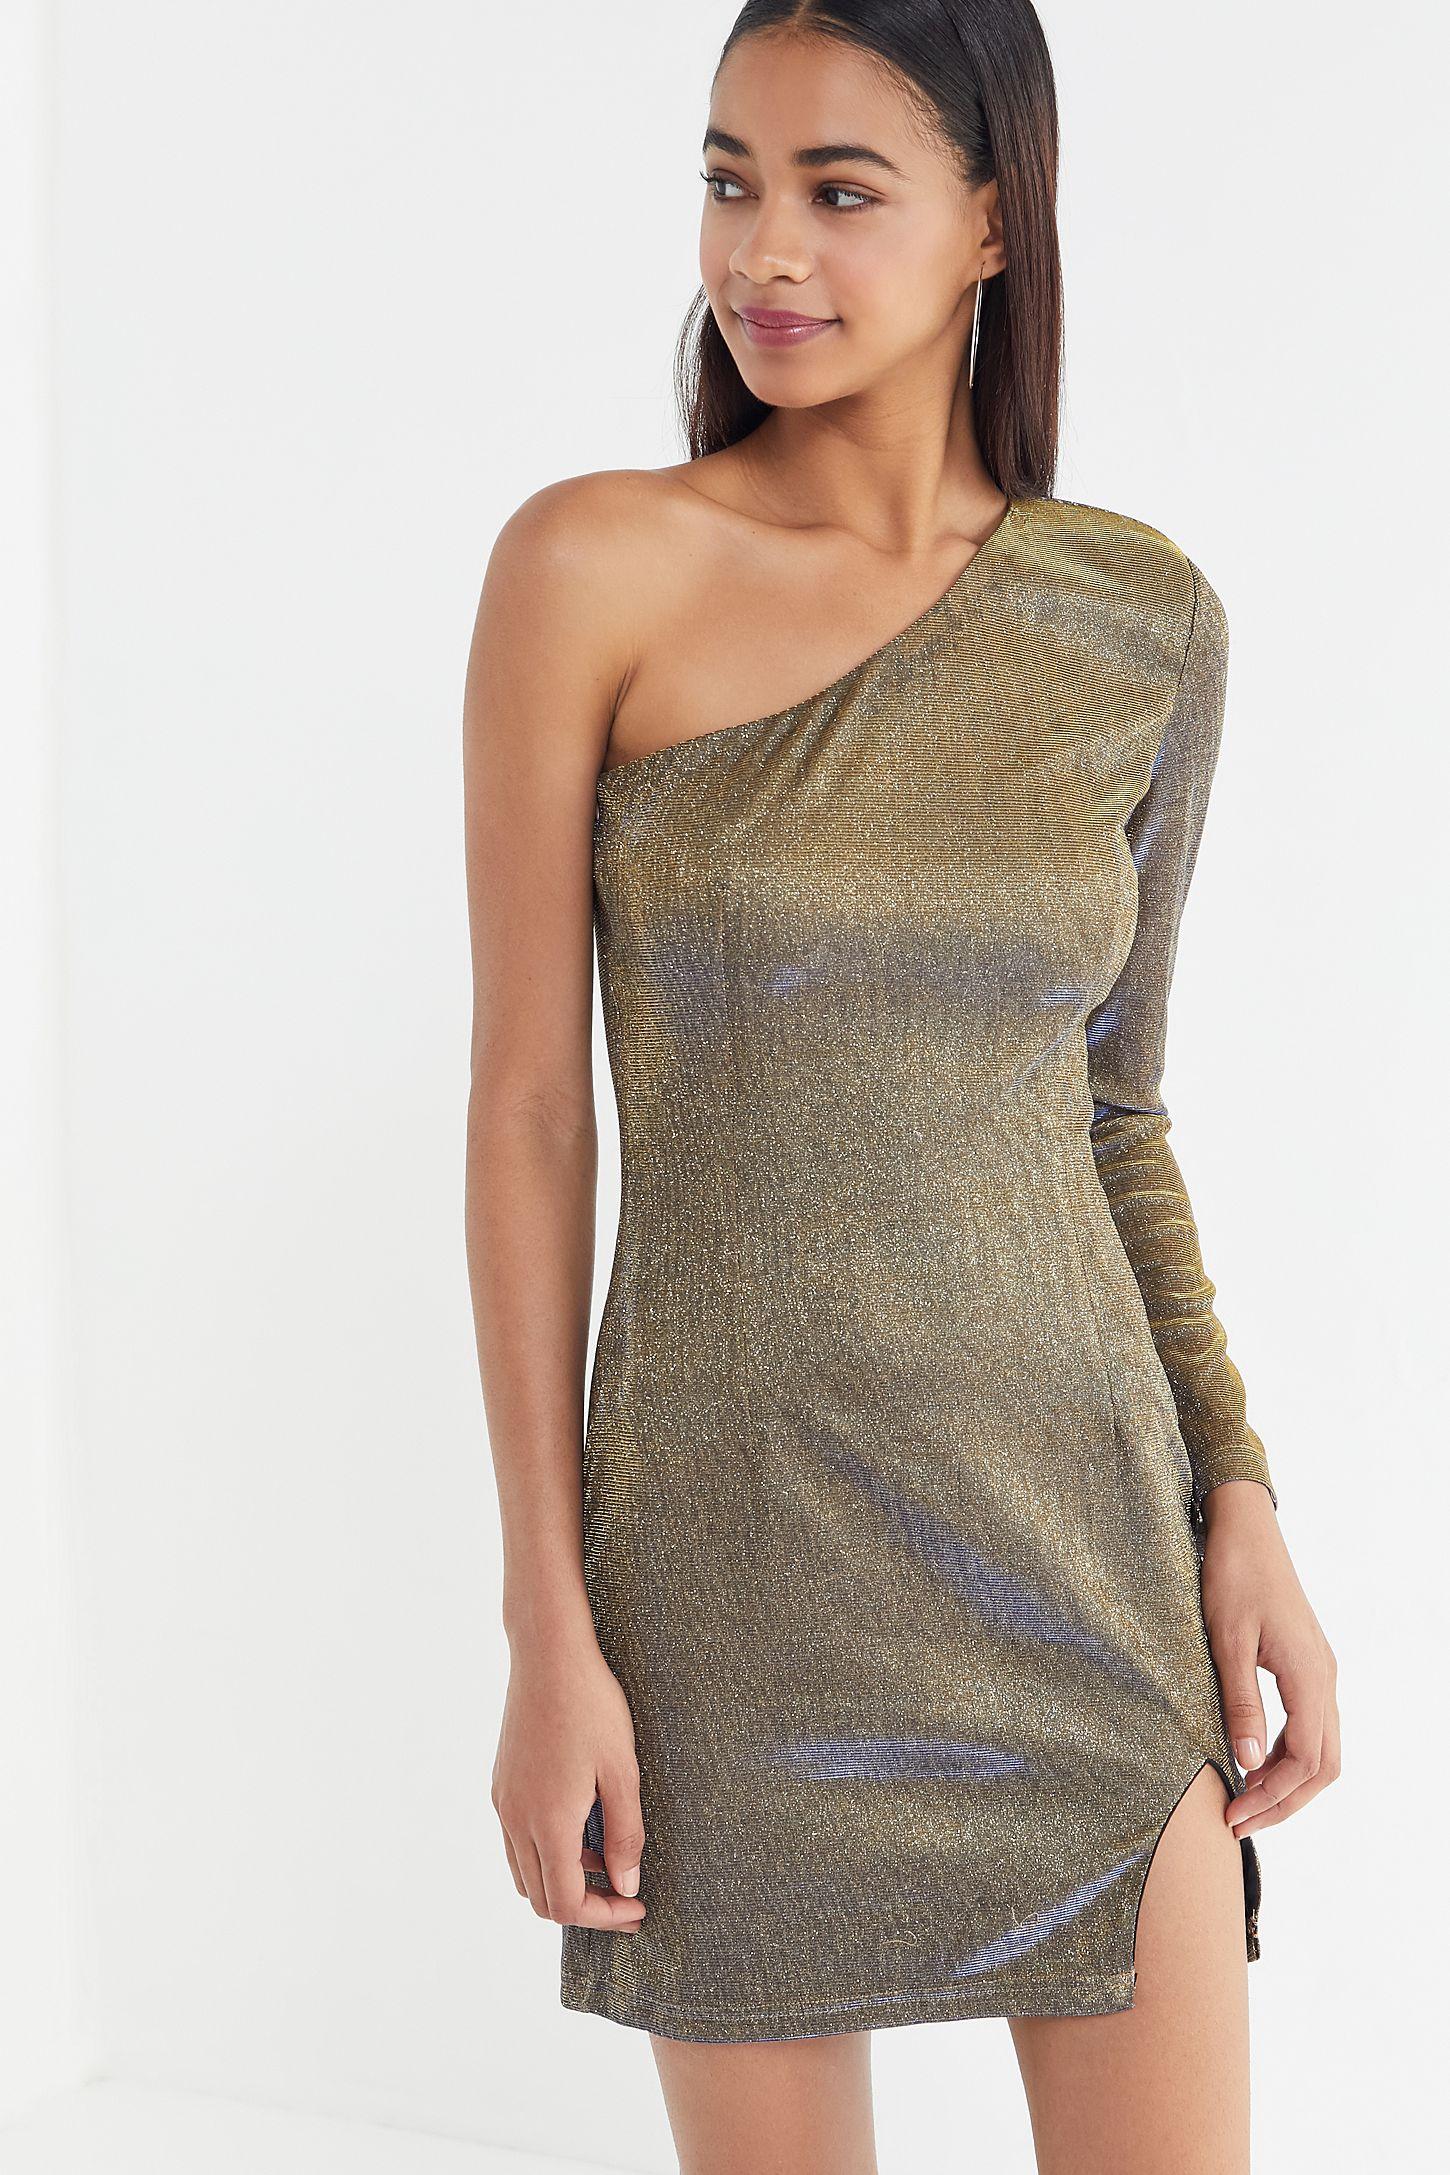 hot products sale online official site Tiger Mist Serene Sparkly One-Shoulder Mini Dress